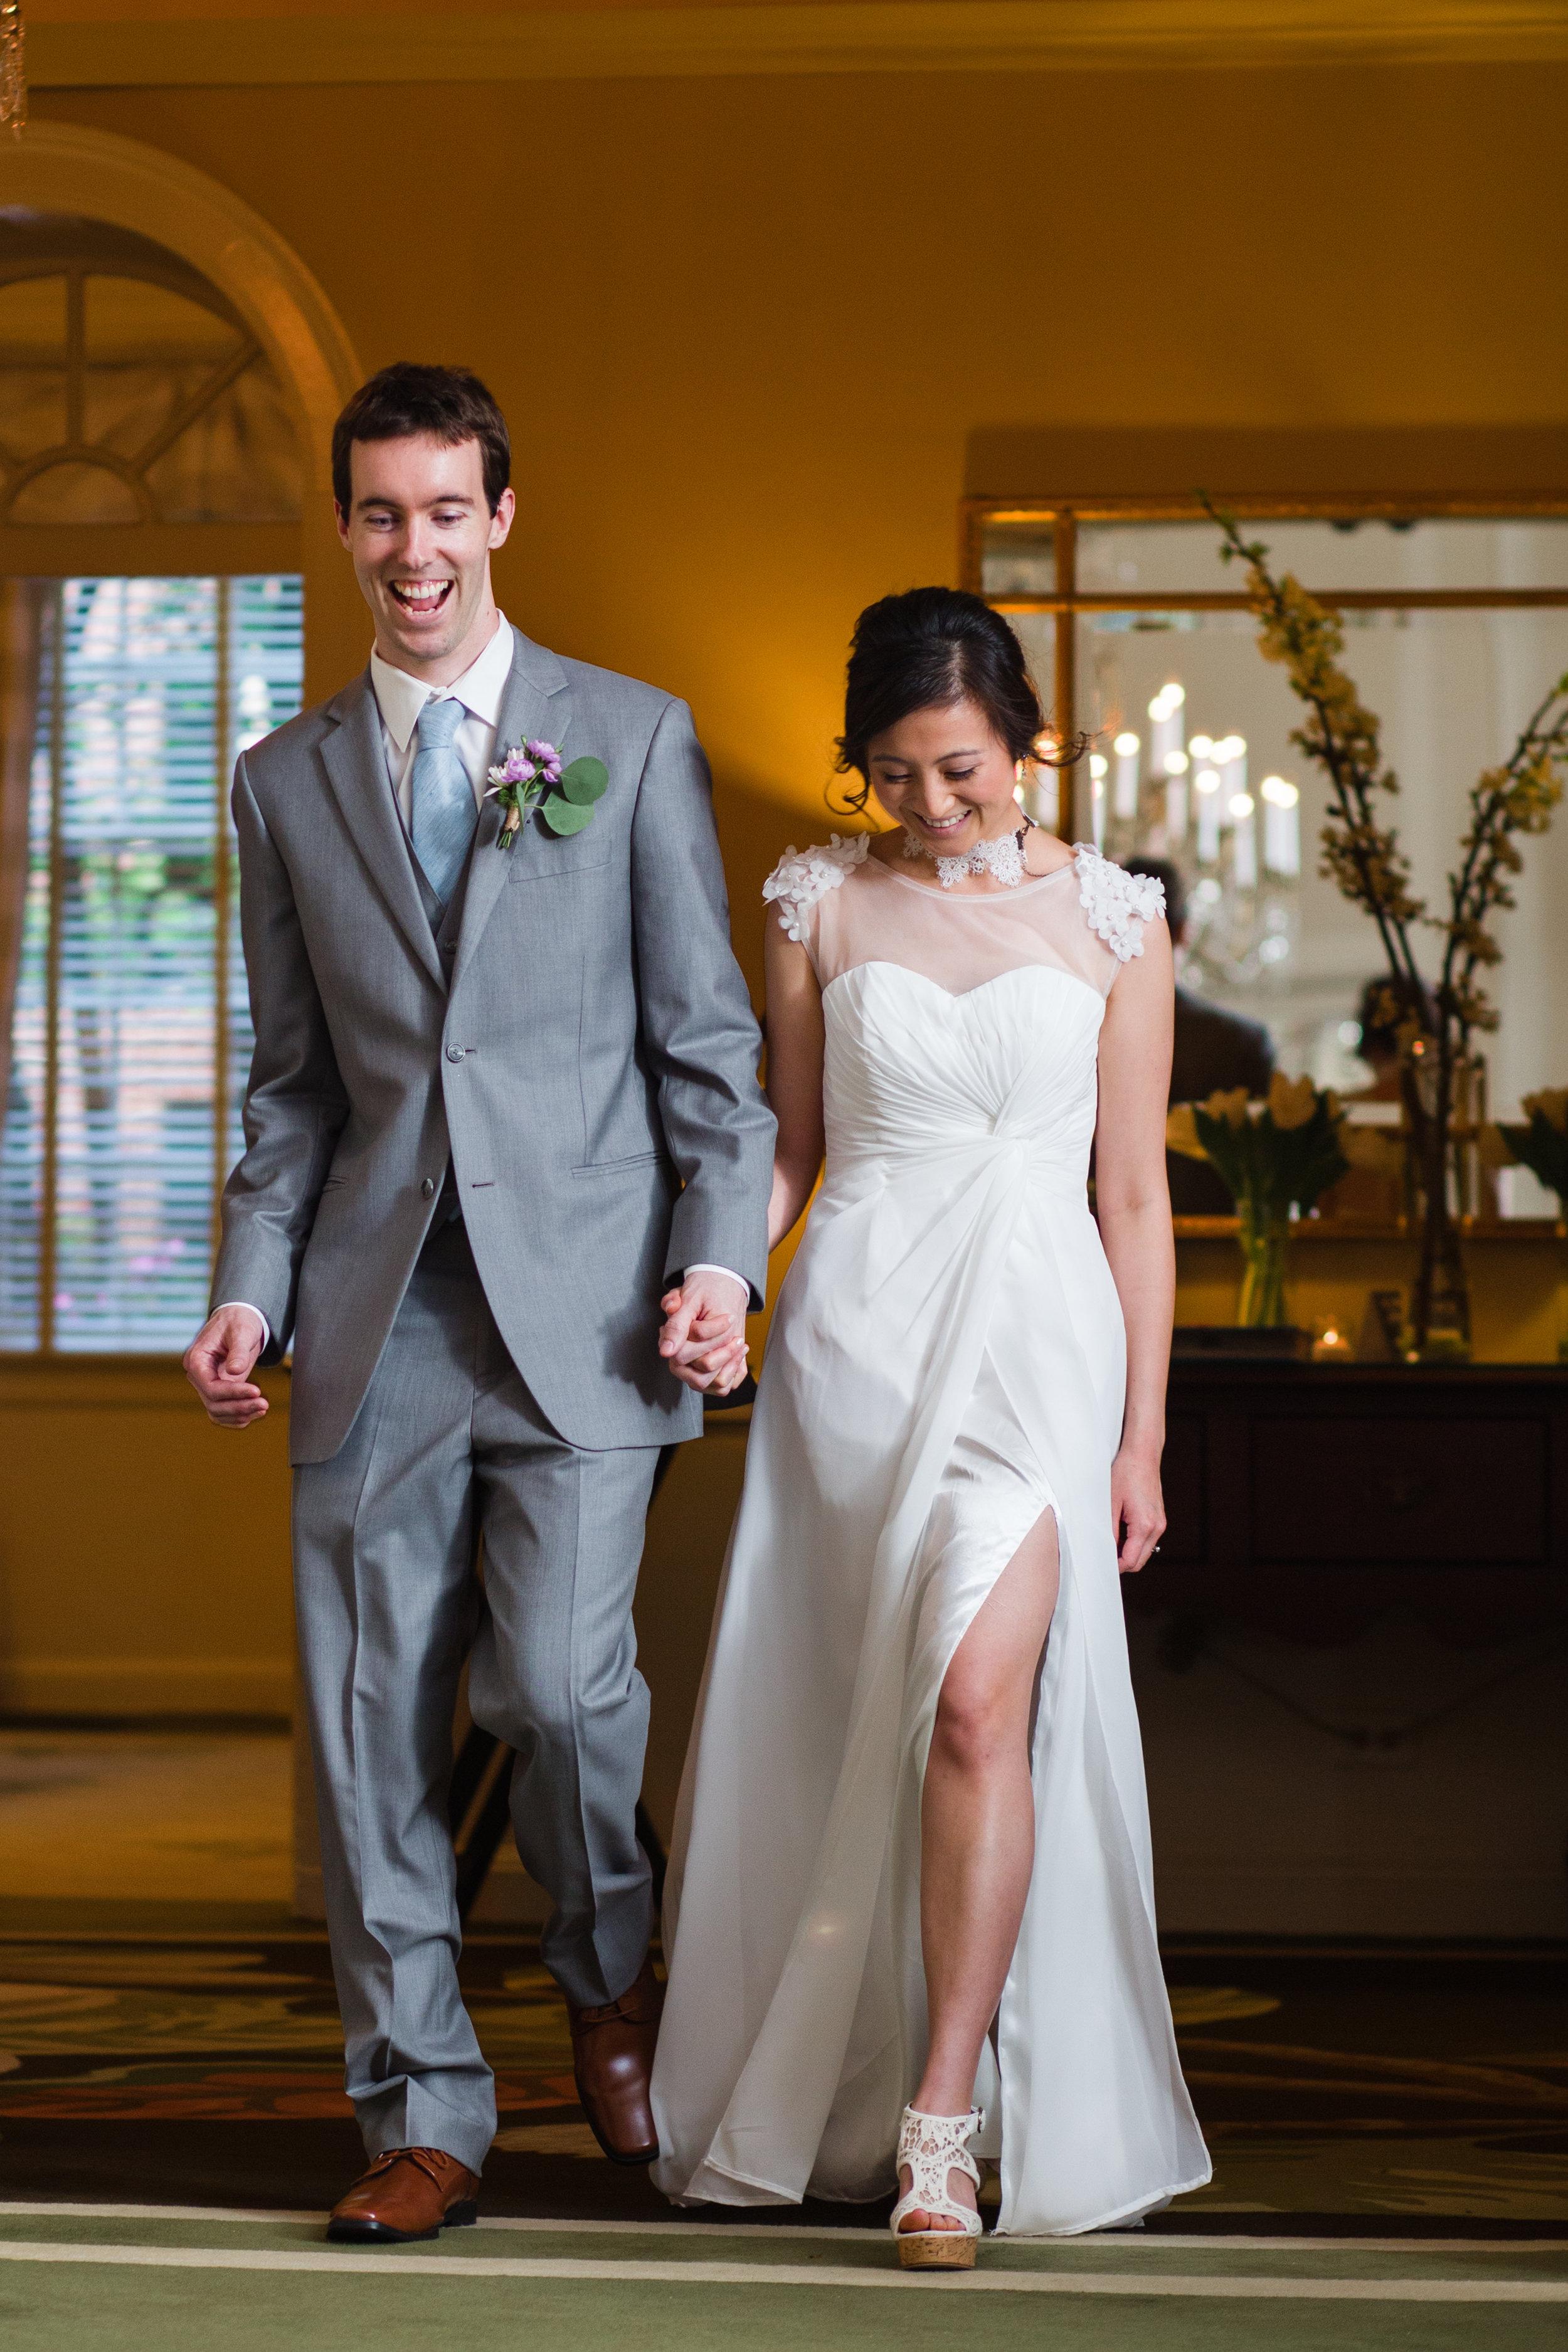 2017_04_30_jenny_jonathans_wedding_reception-52.jpg